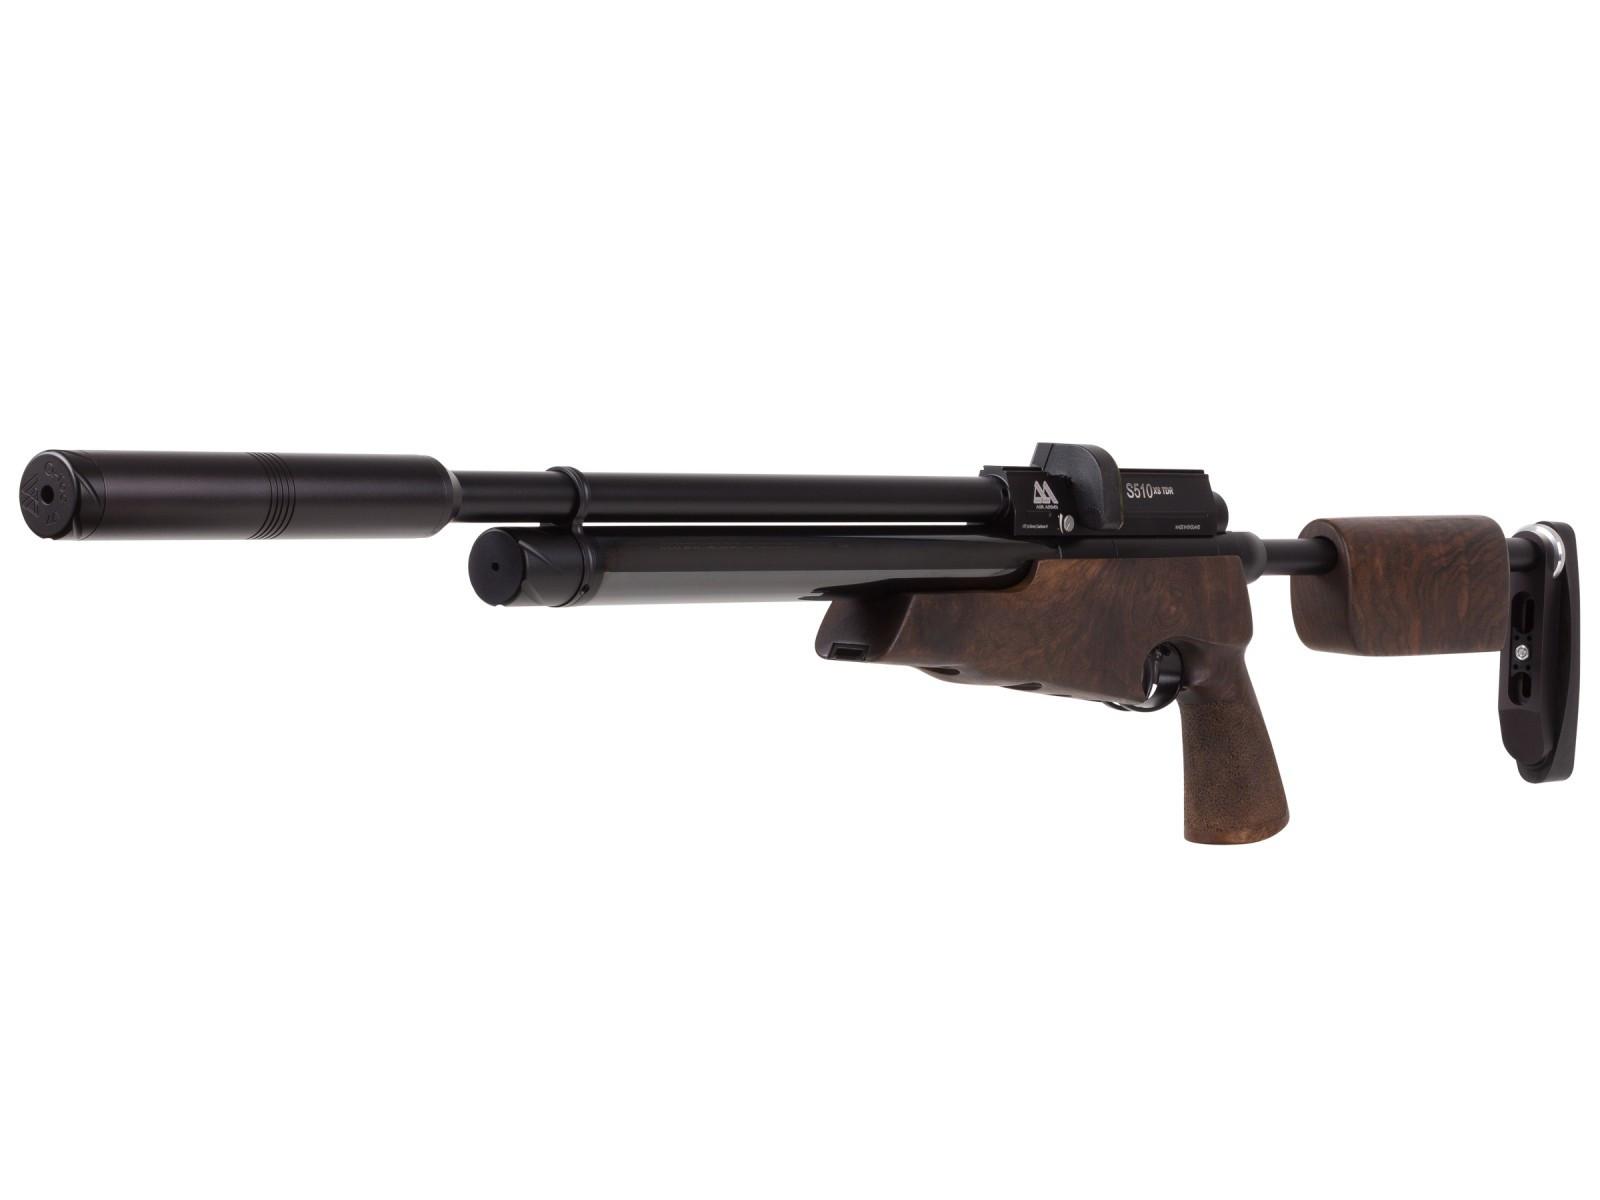 Air Arms S510 XS TDR Regulated, Walnut, PCP Air Rifle